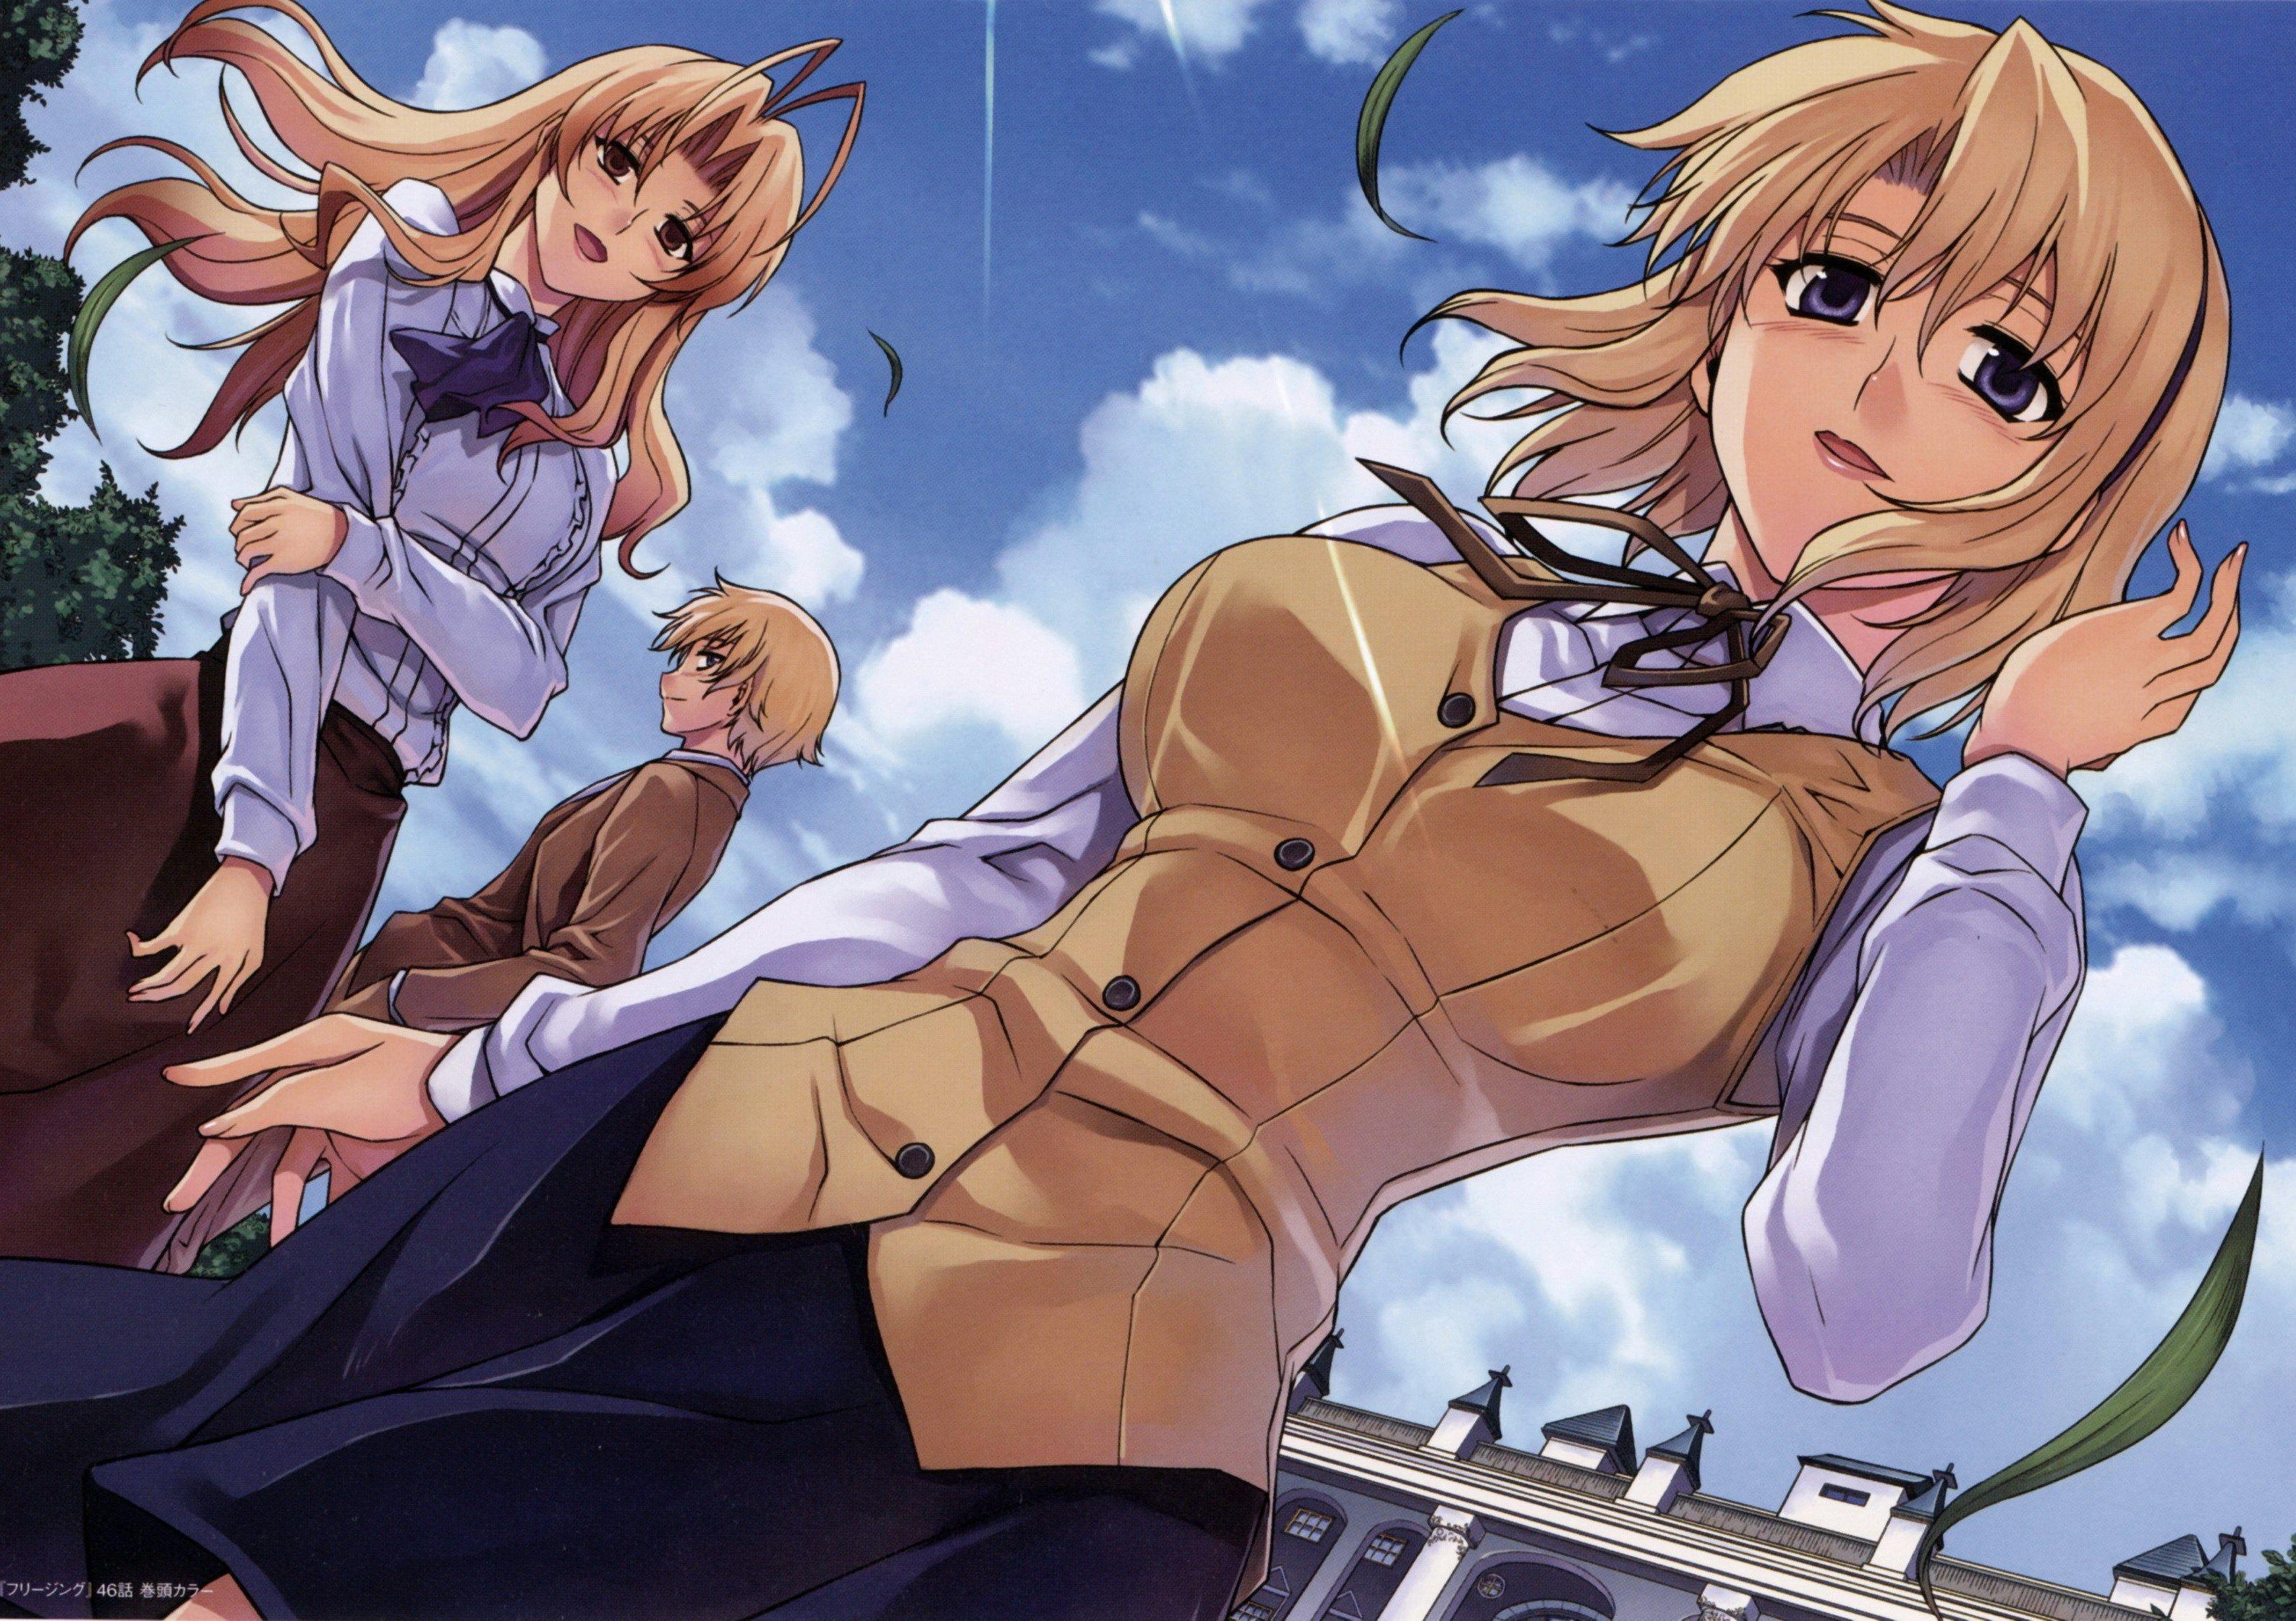 Freezing Free For Desktop Anime Anime Wallpaper Freezing Anime Freezing anime desktop wallpaper